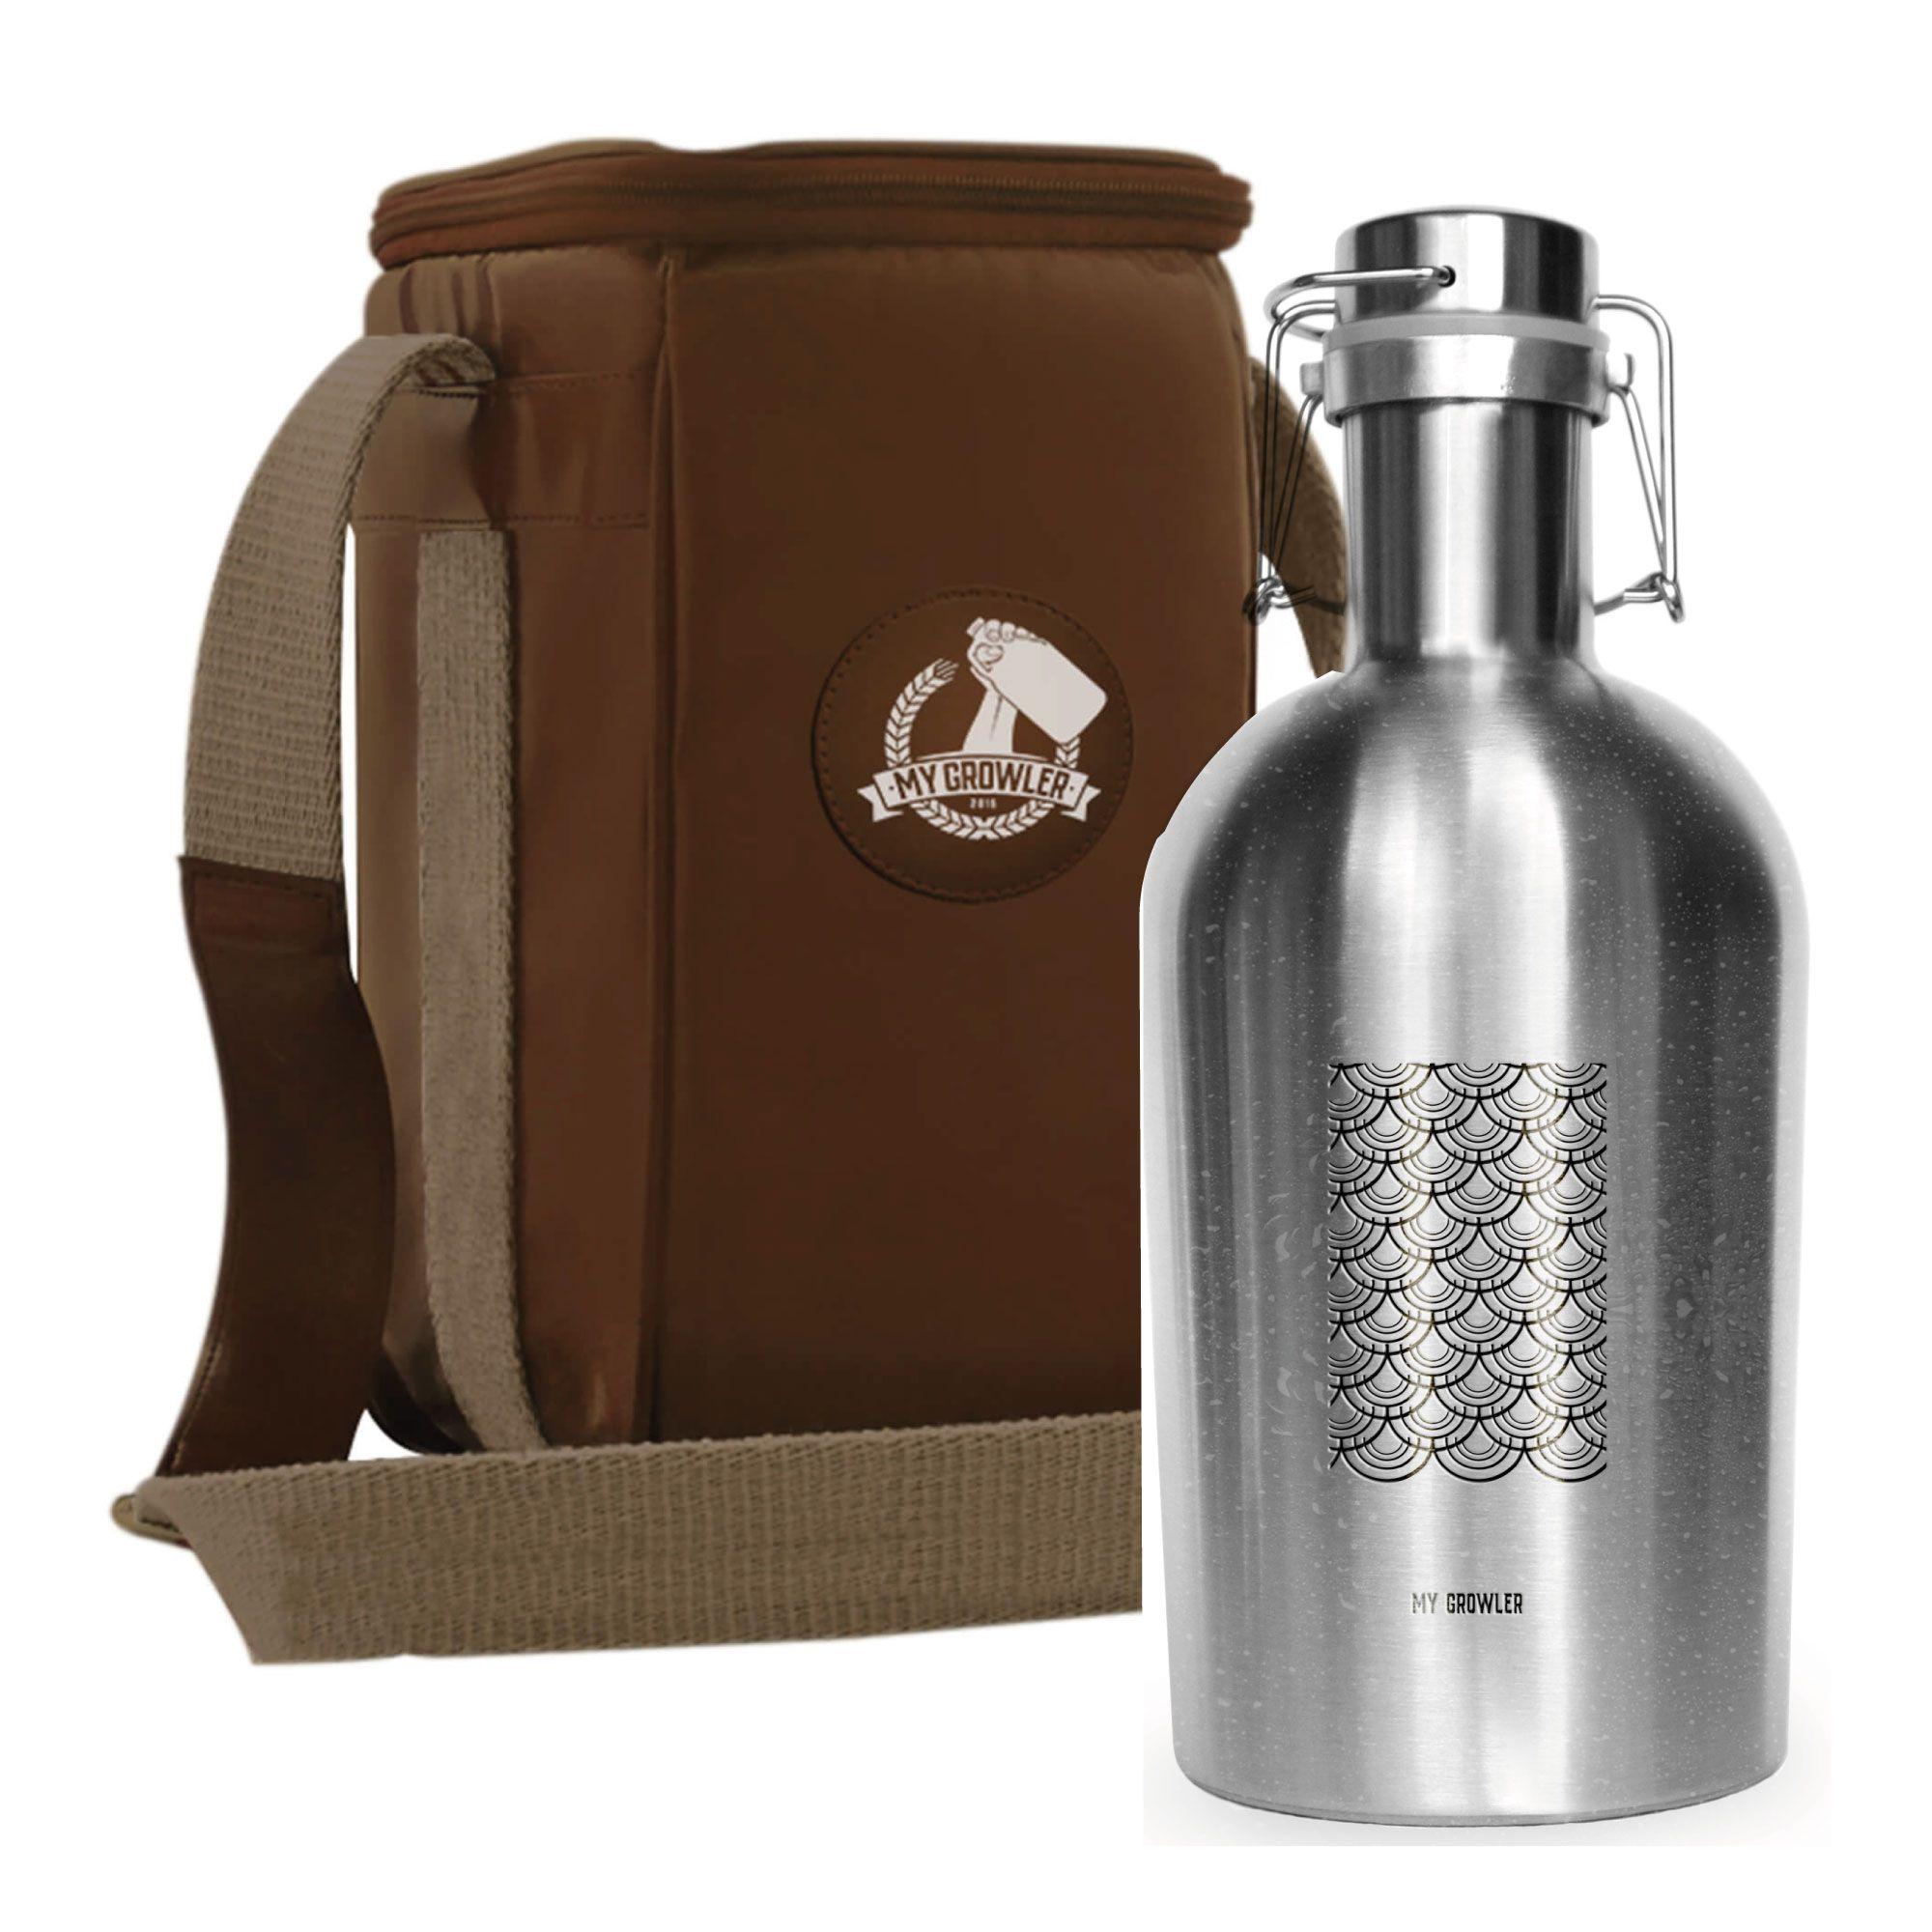 Kit Growler Inox 2 litros Tokyo + Growler Bag Travel Bege